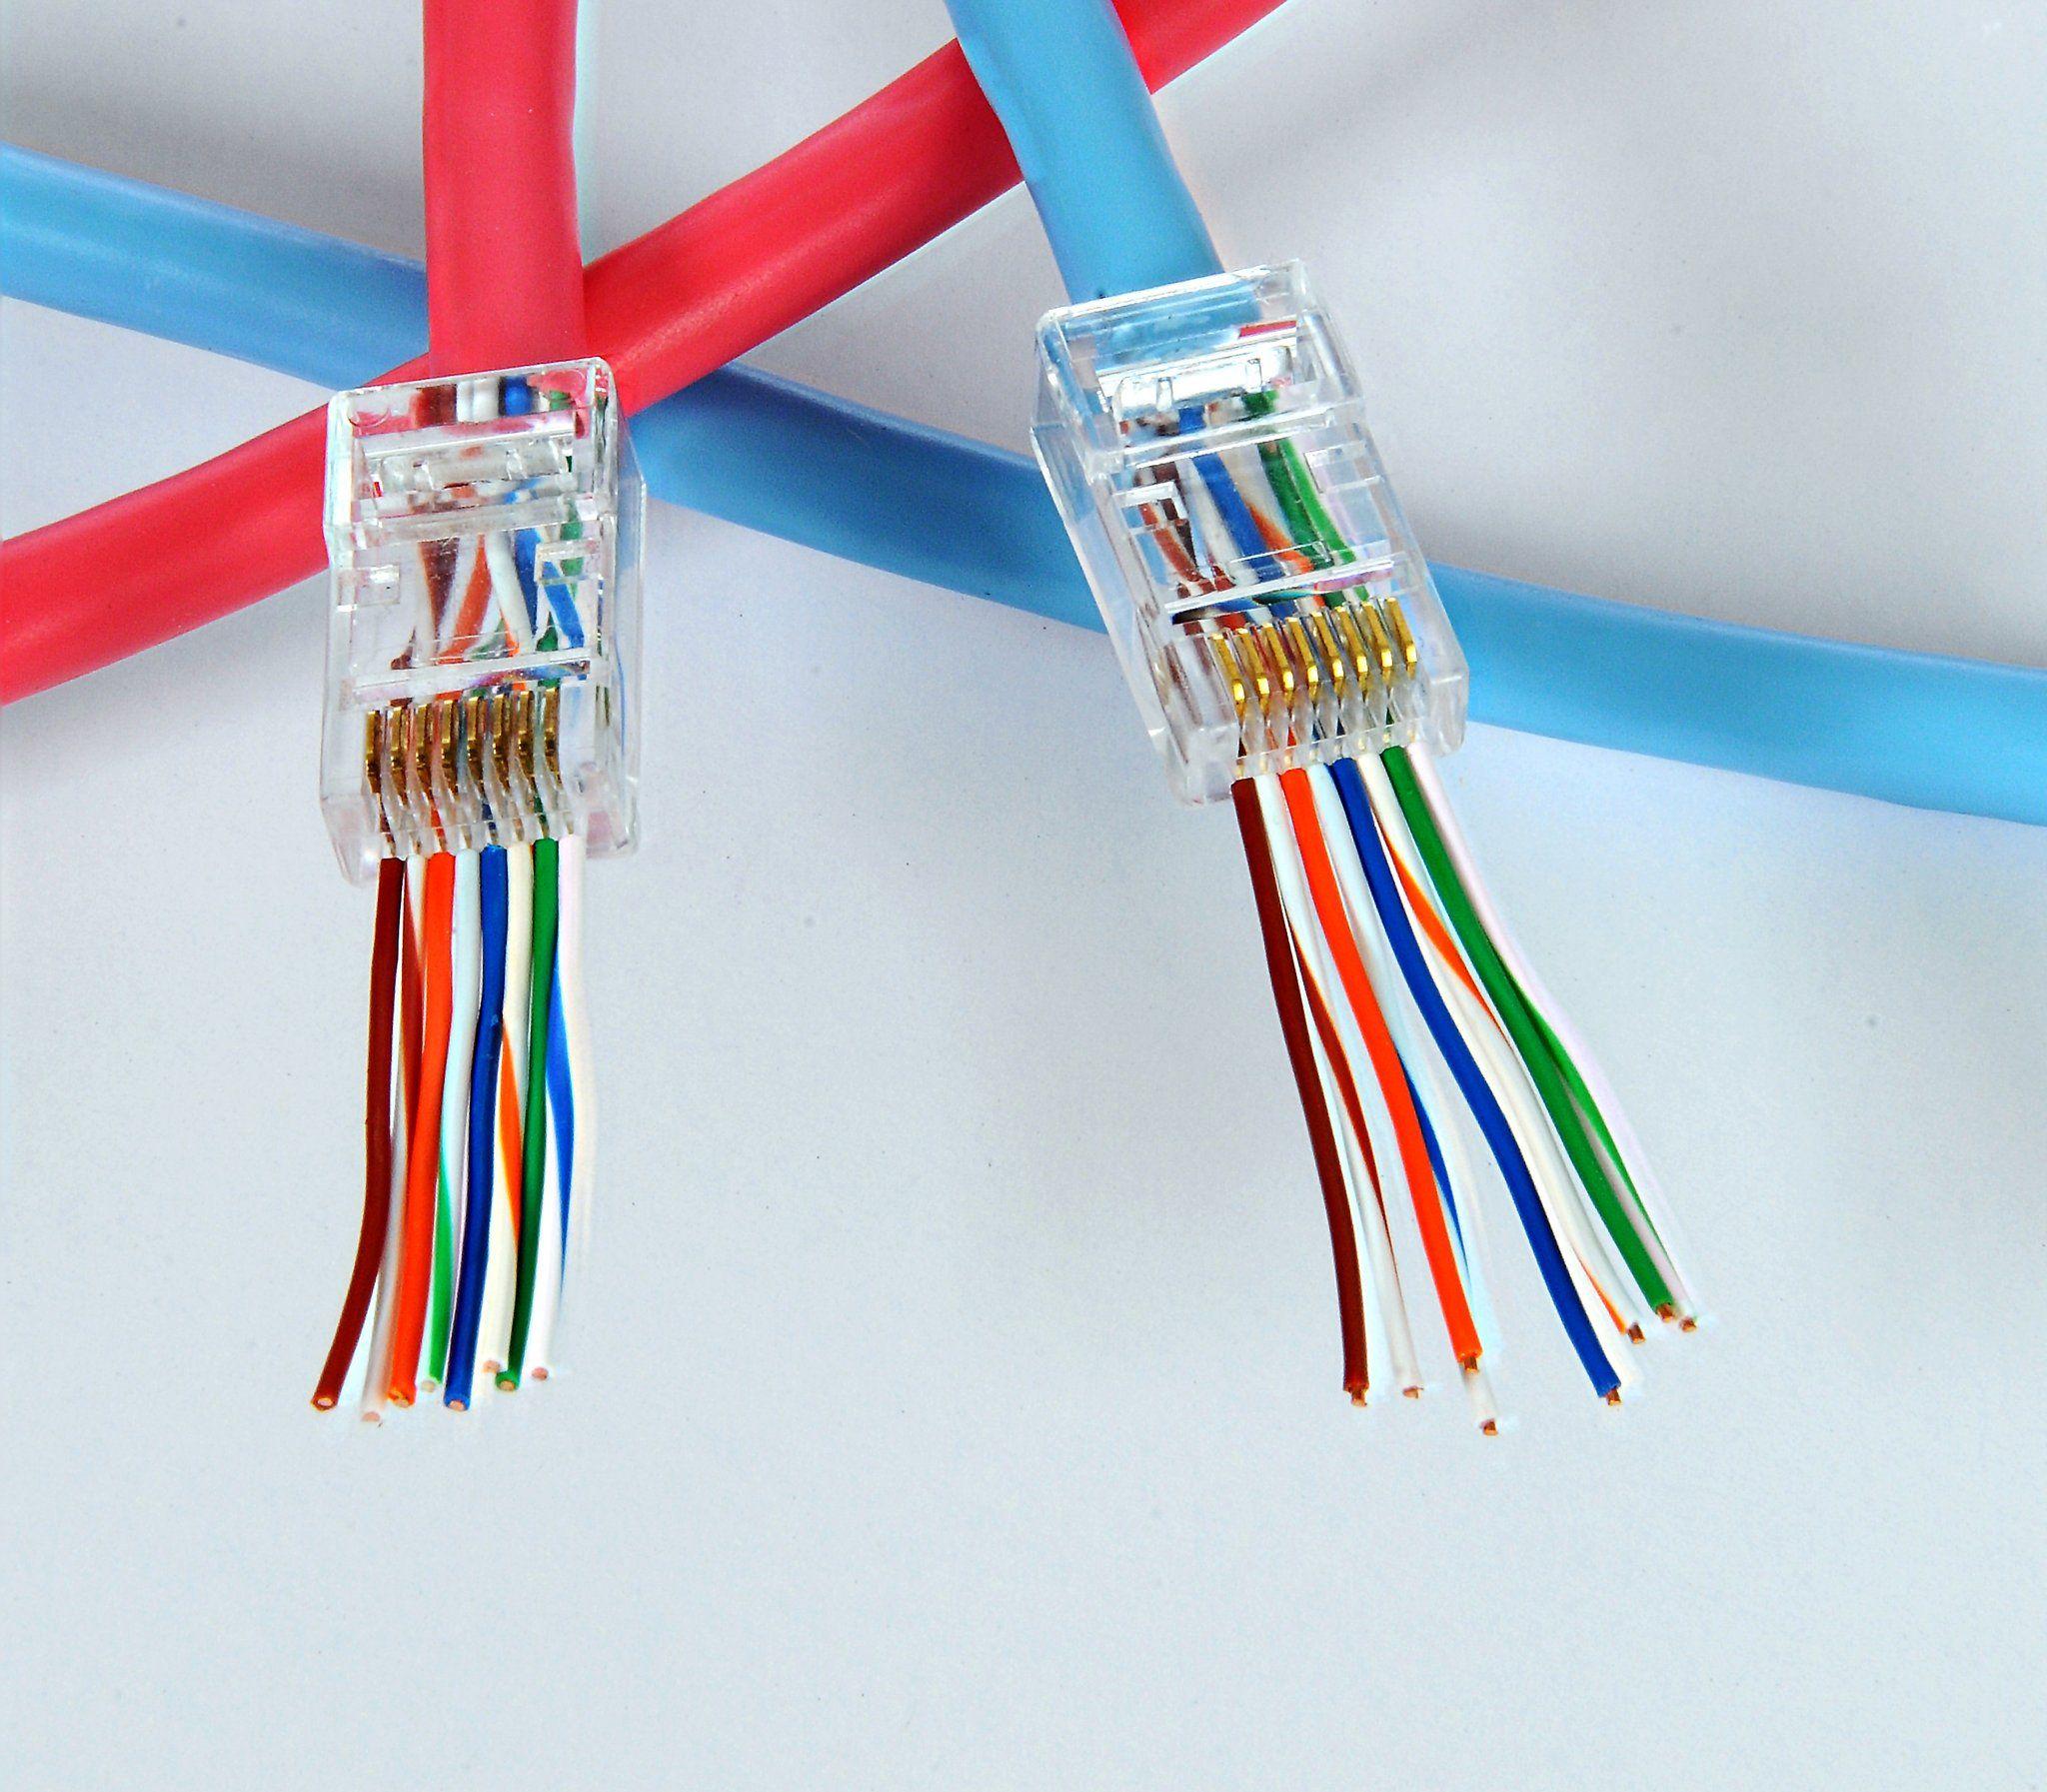 50PCS Modular Plug Network Cable LAN Connector Plug End 8P8C CAT6 RJ45